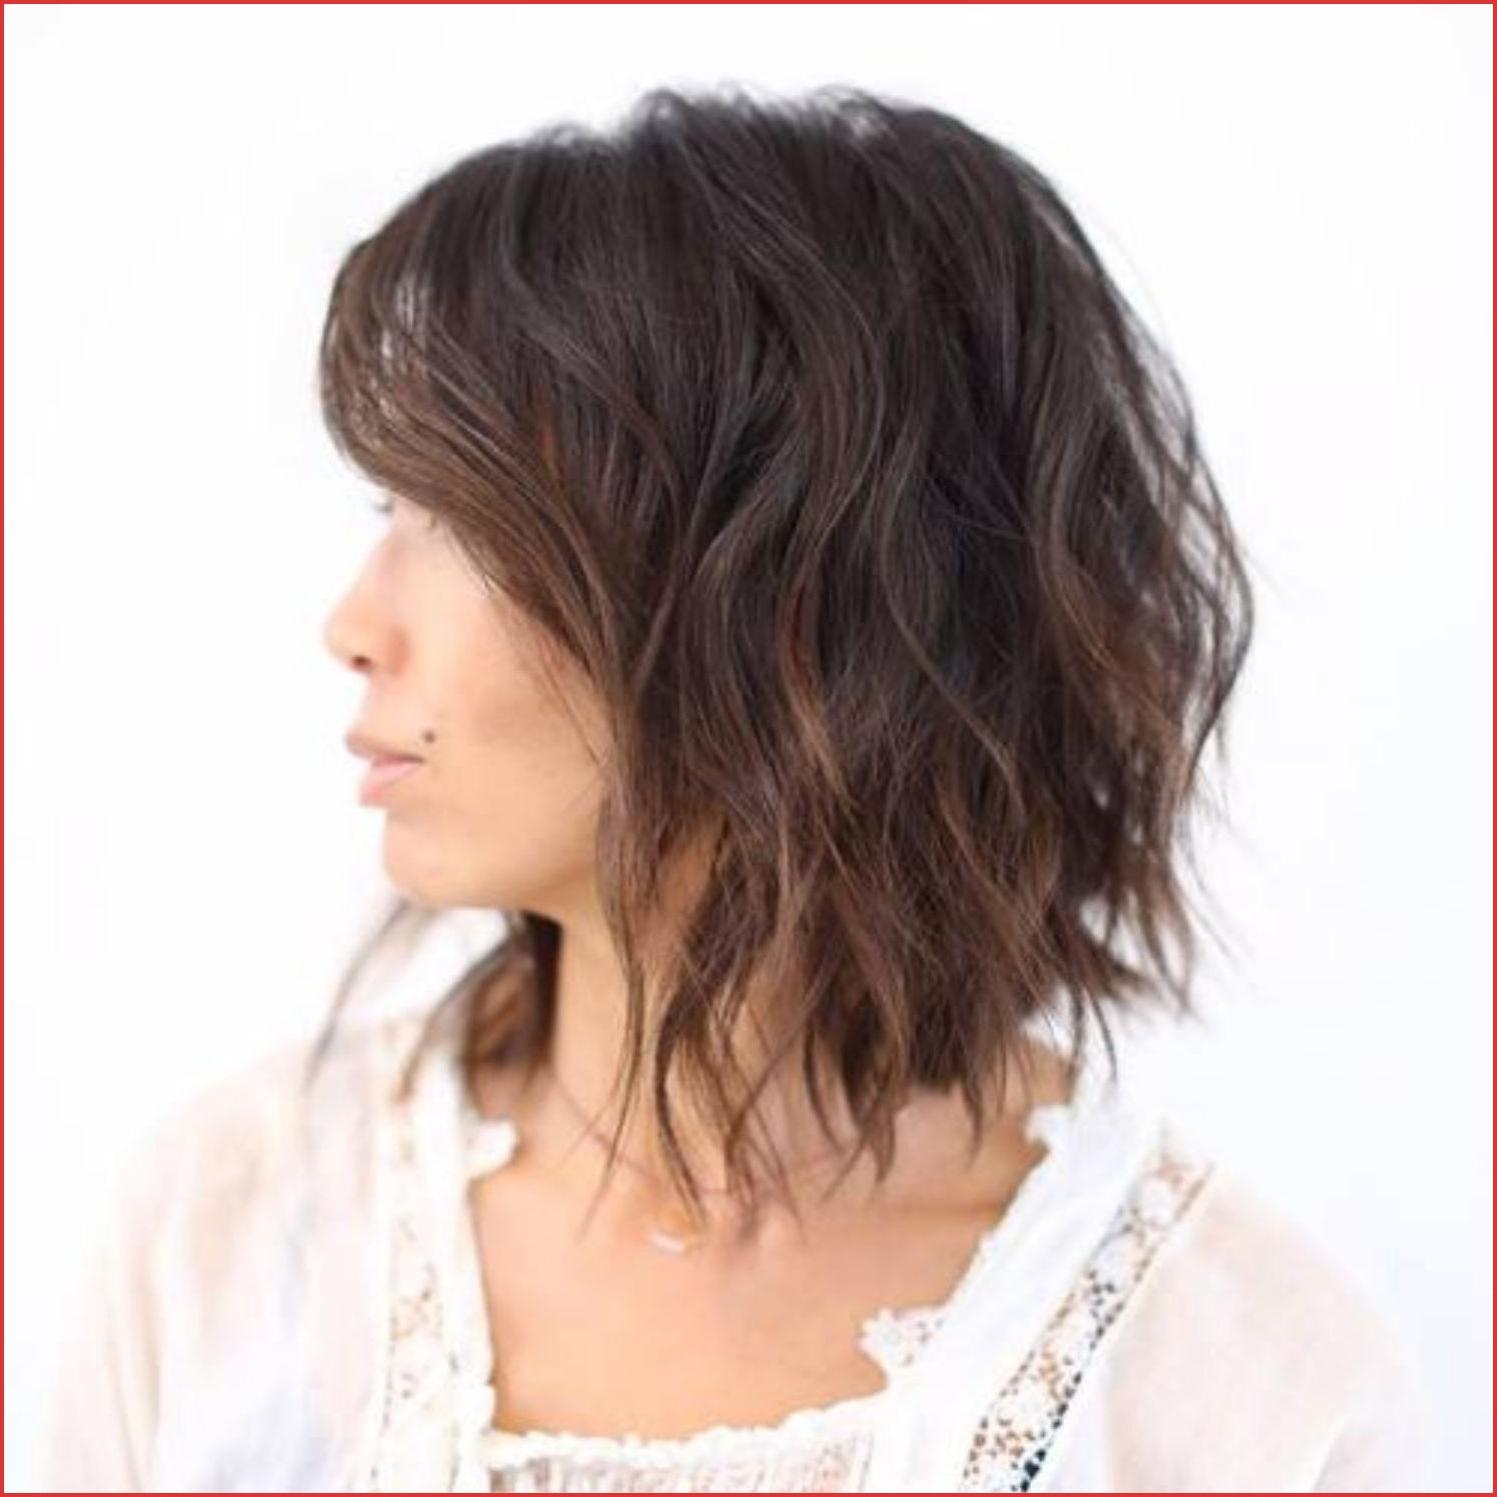 Hairstyles : Short Medium Haircuts Glamorous Hairstyles Choppy With Latest Glamorous Medium Haircuts (View 2 of 20)